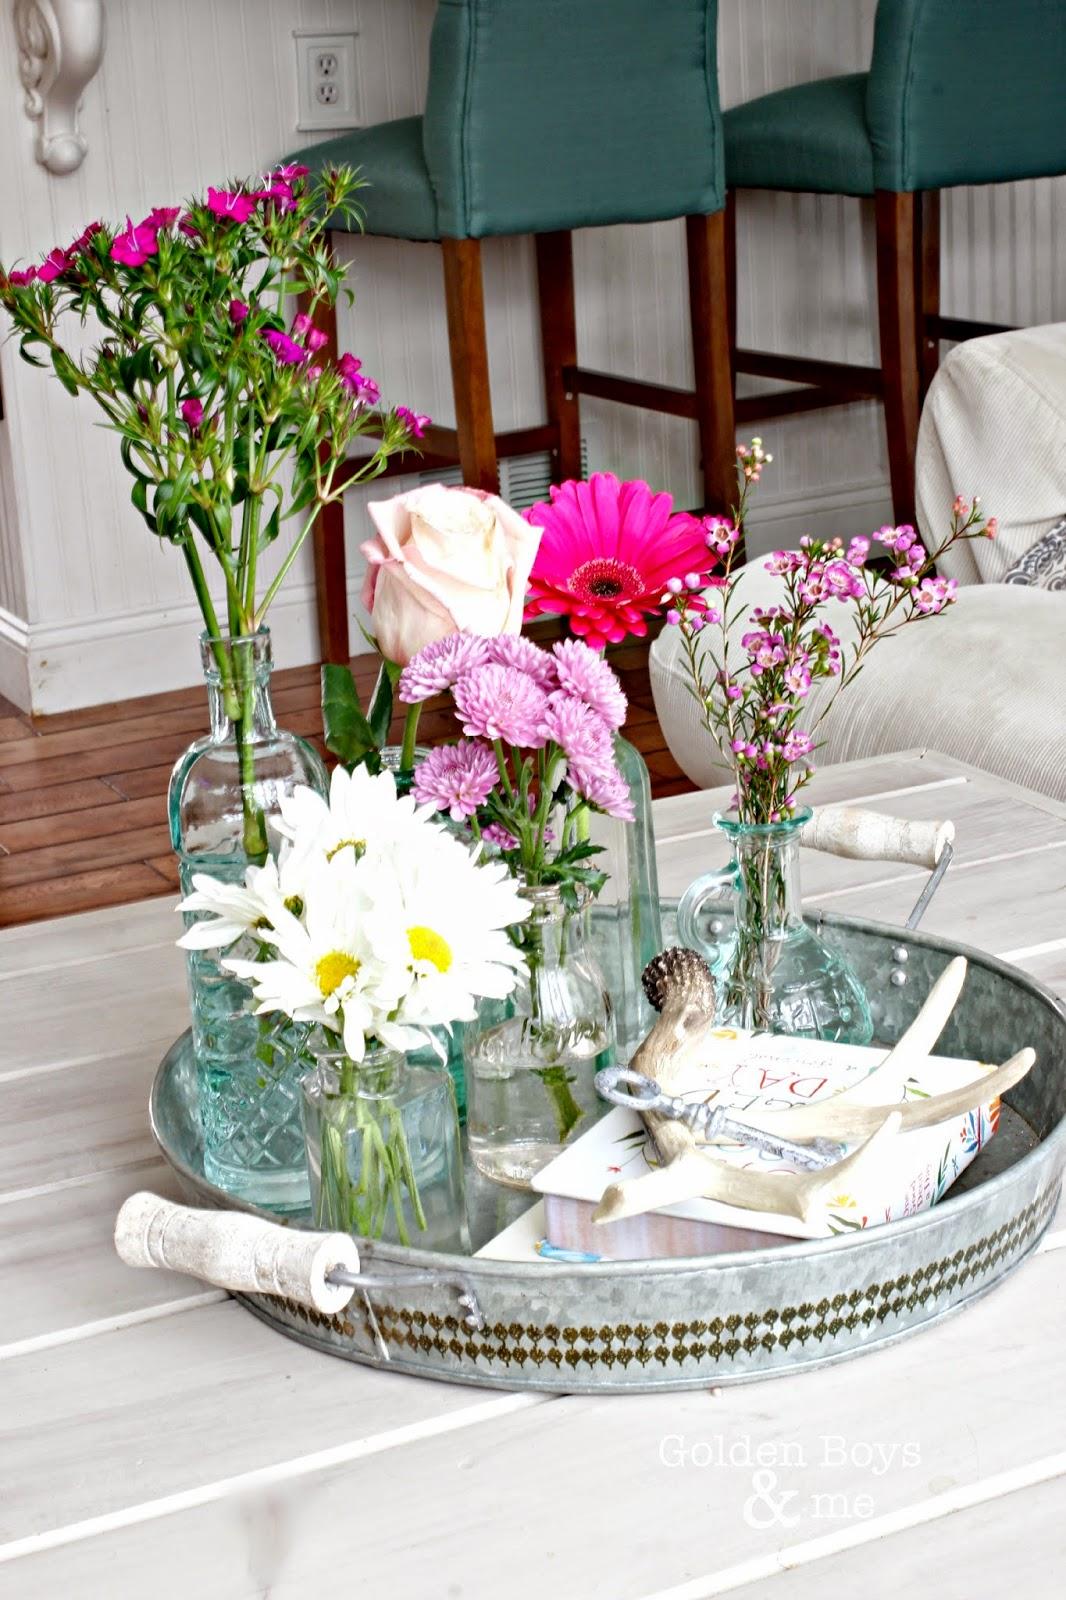 Spring flowers on galvanized tray-www.goldenboysandme.com